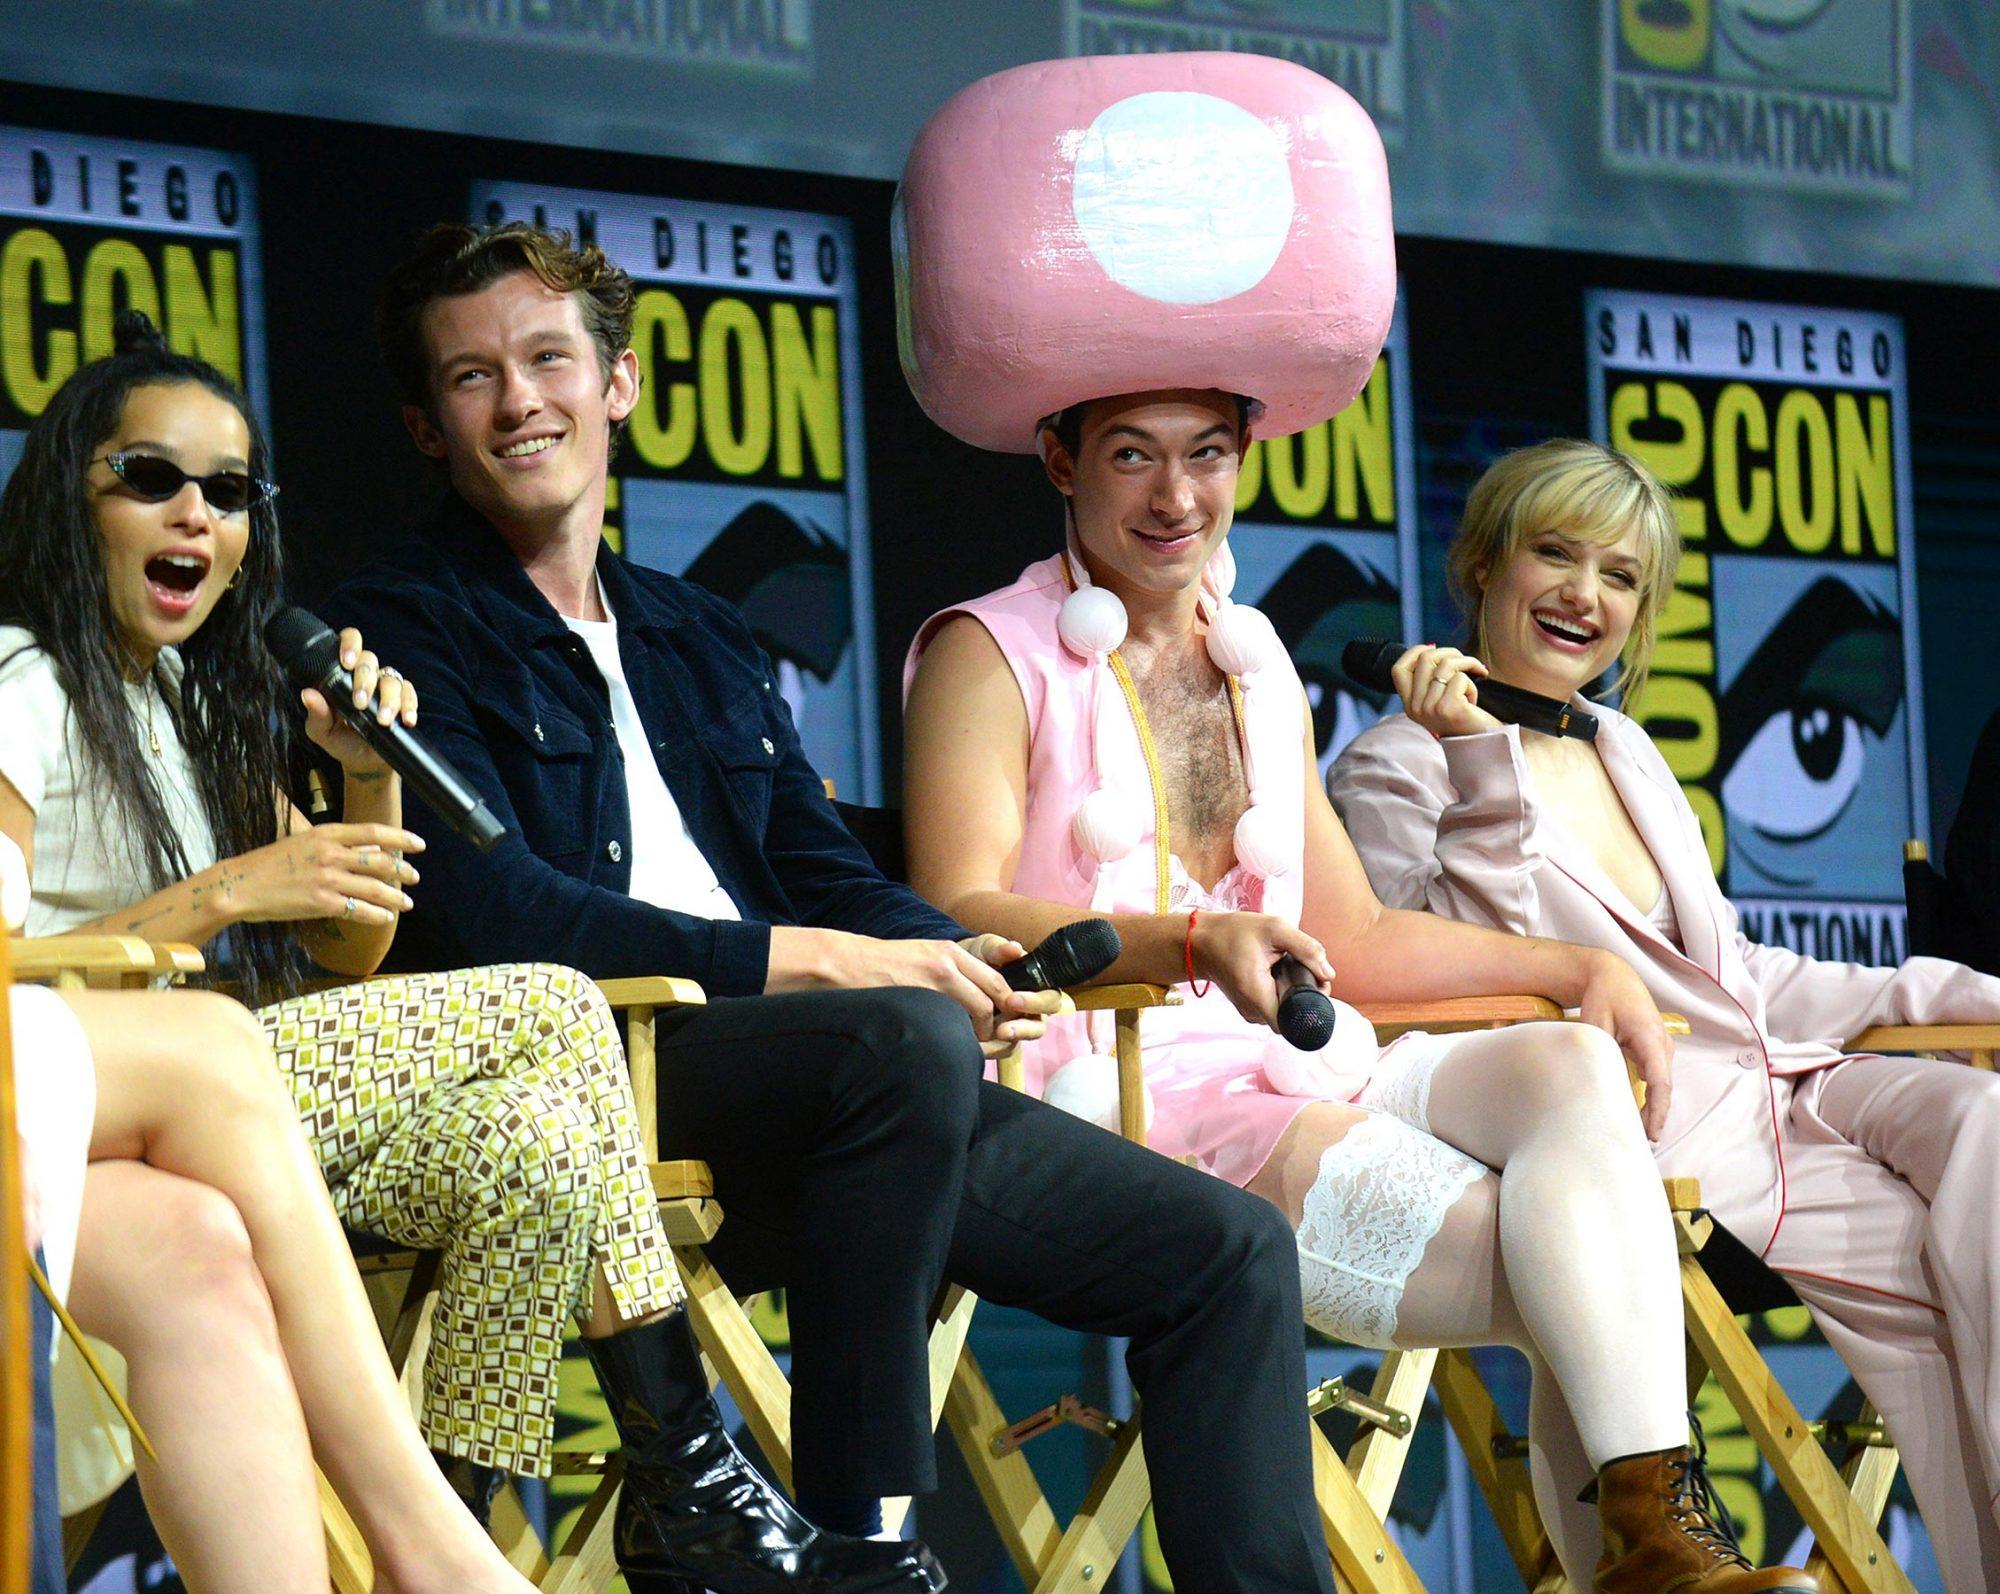 'Warner Bros Studio' panel, Comic-Con International, San Diego, USA - 21 Jul 2018